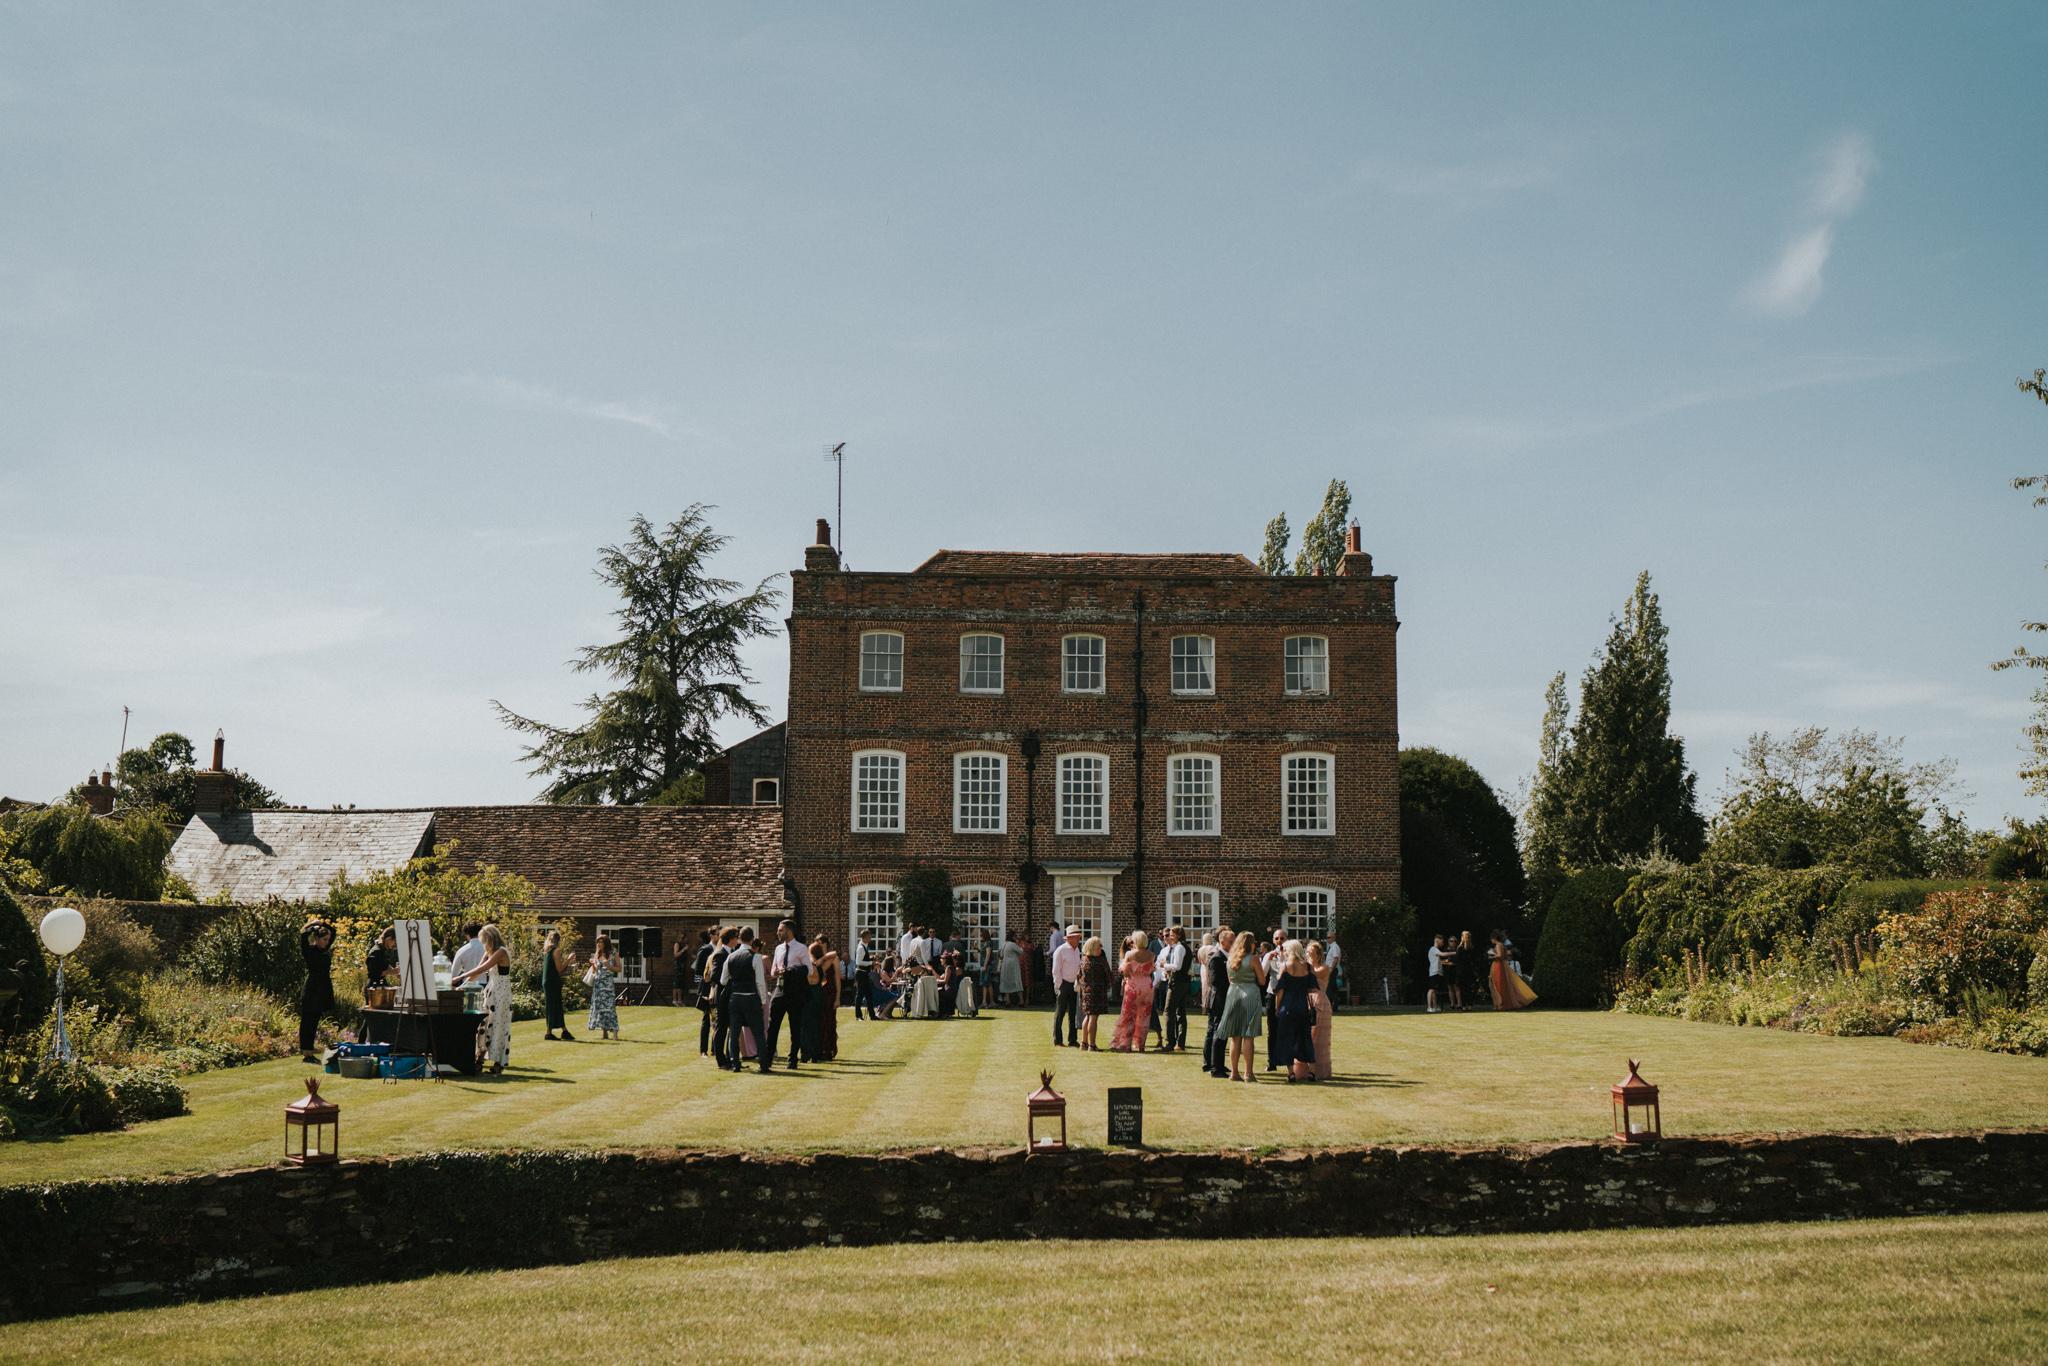 emi-Jack-boho-diy-wedding-eggington-house-grace-elizabeth-colchester-essex-alternative-wedding-photographer-suffolk-norfolk-devon (23 of 56).jpg